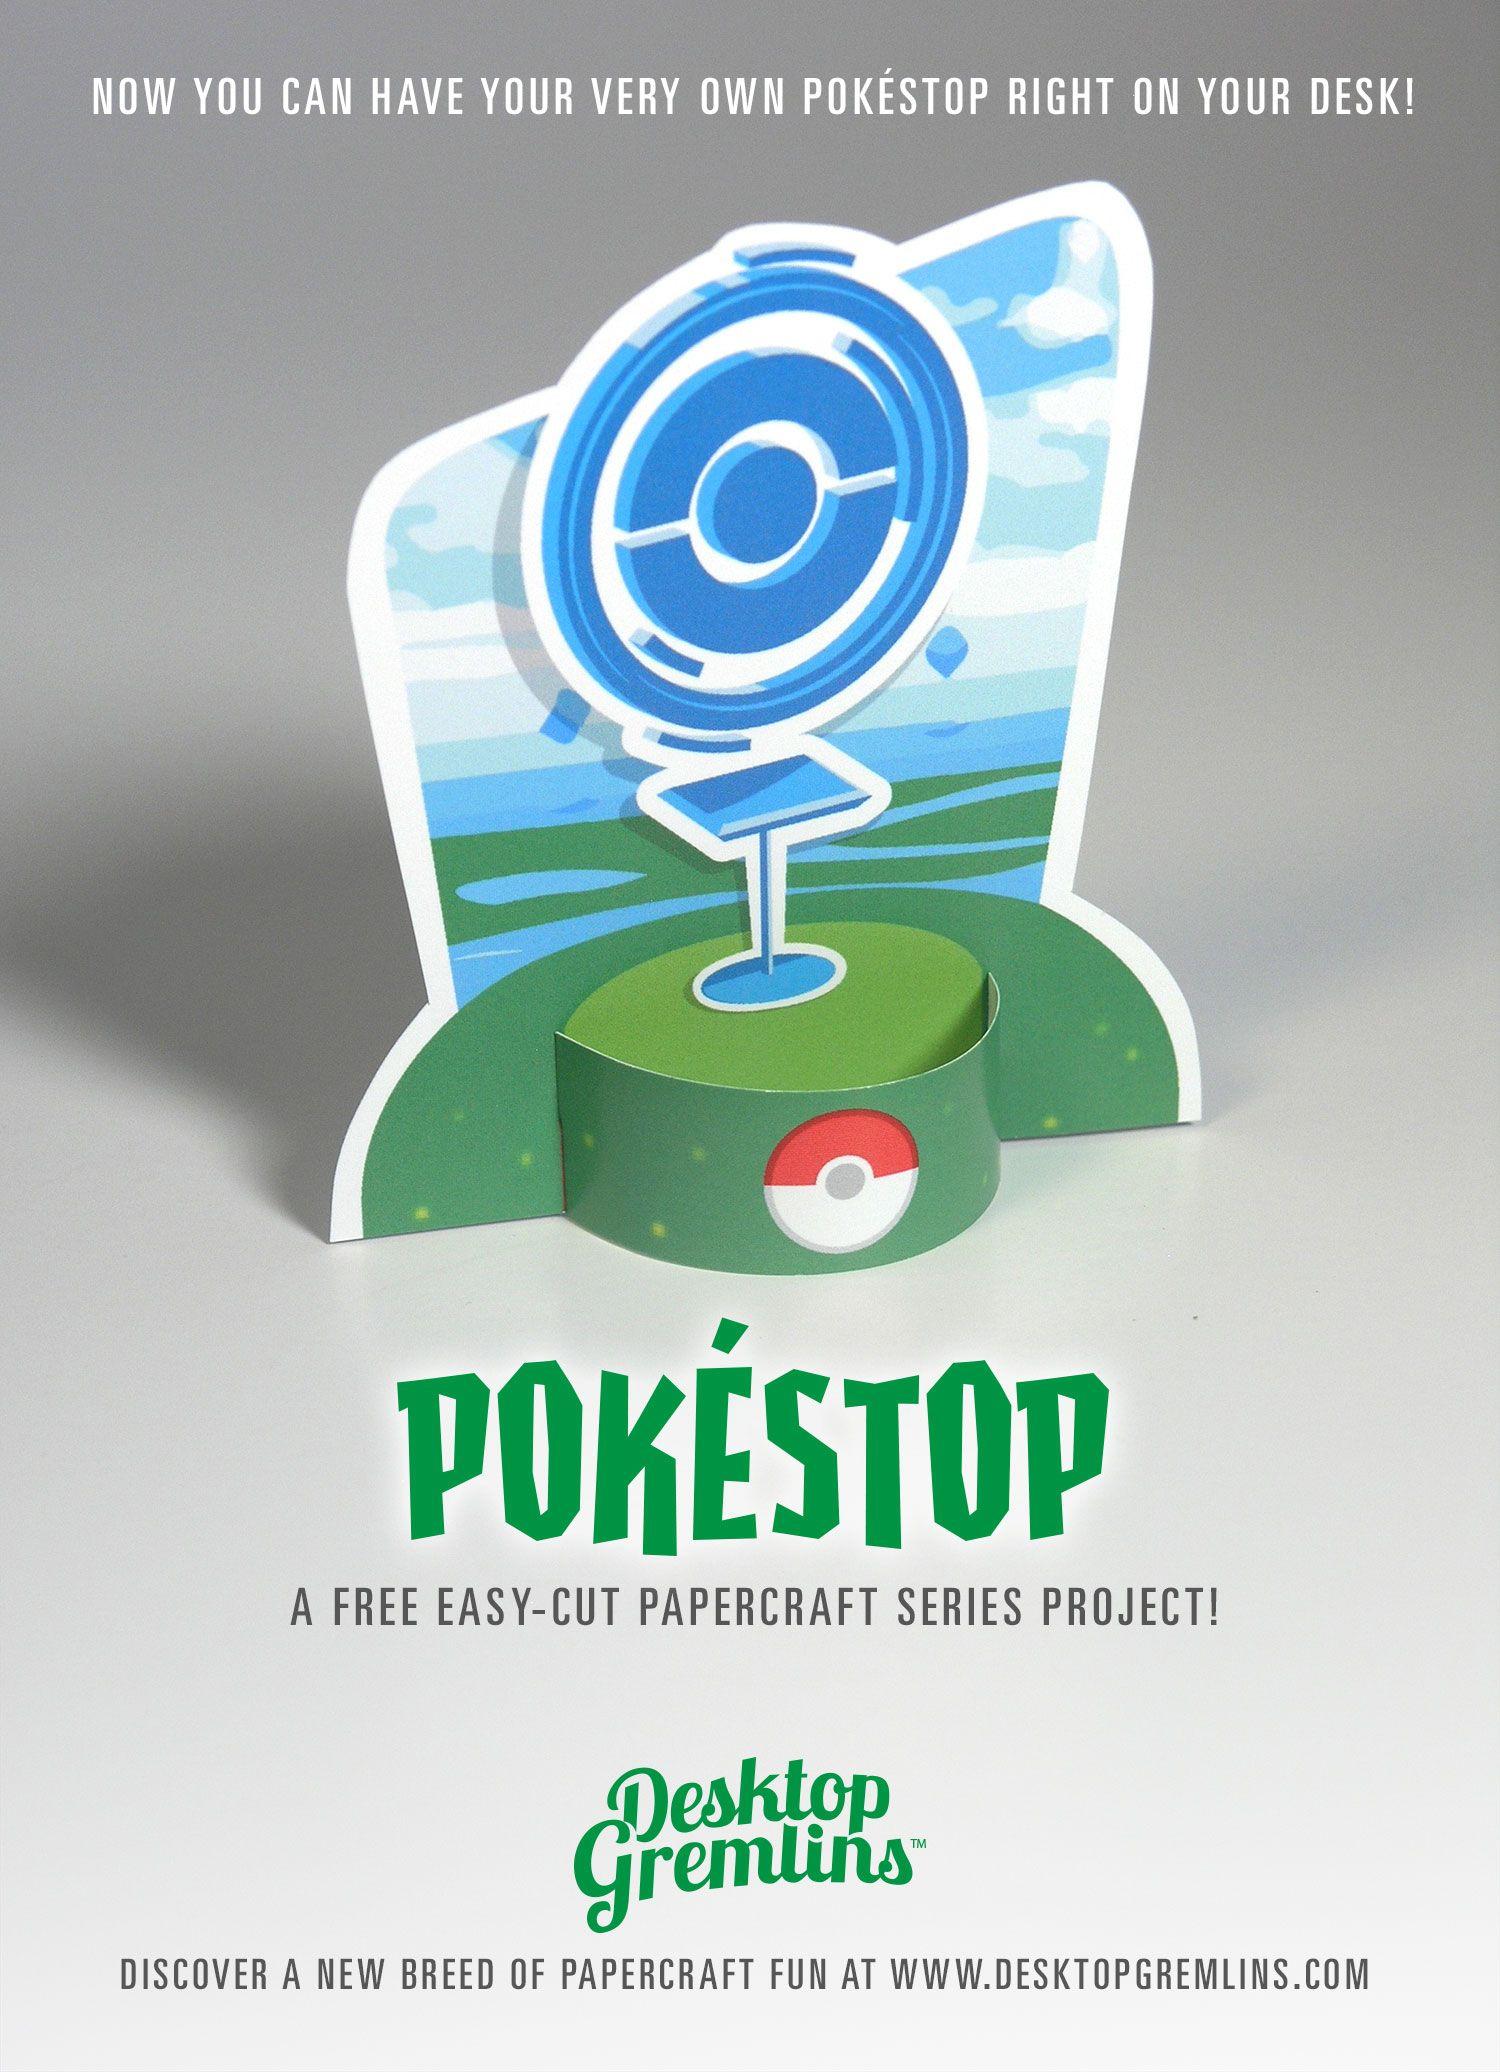 pokemongo free papercraft available at desktop gremlins